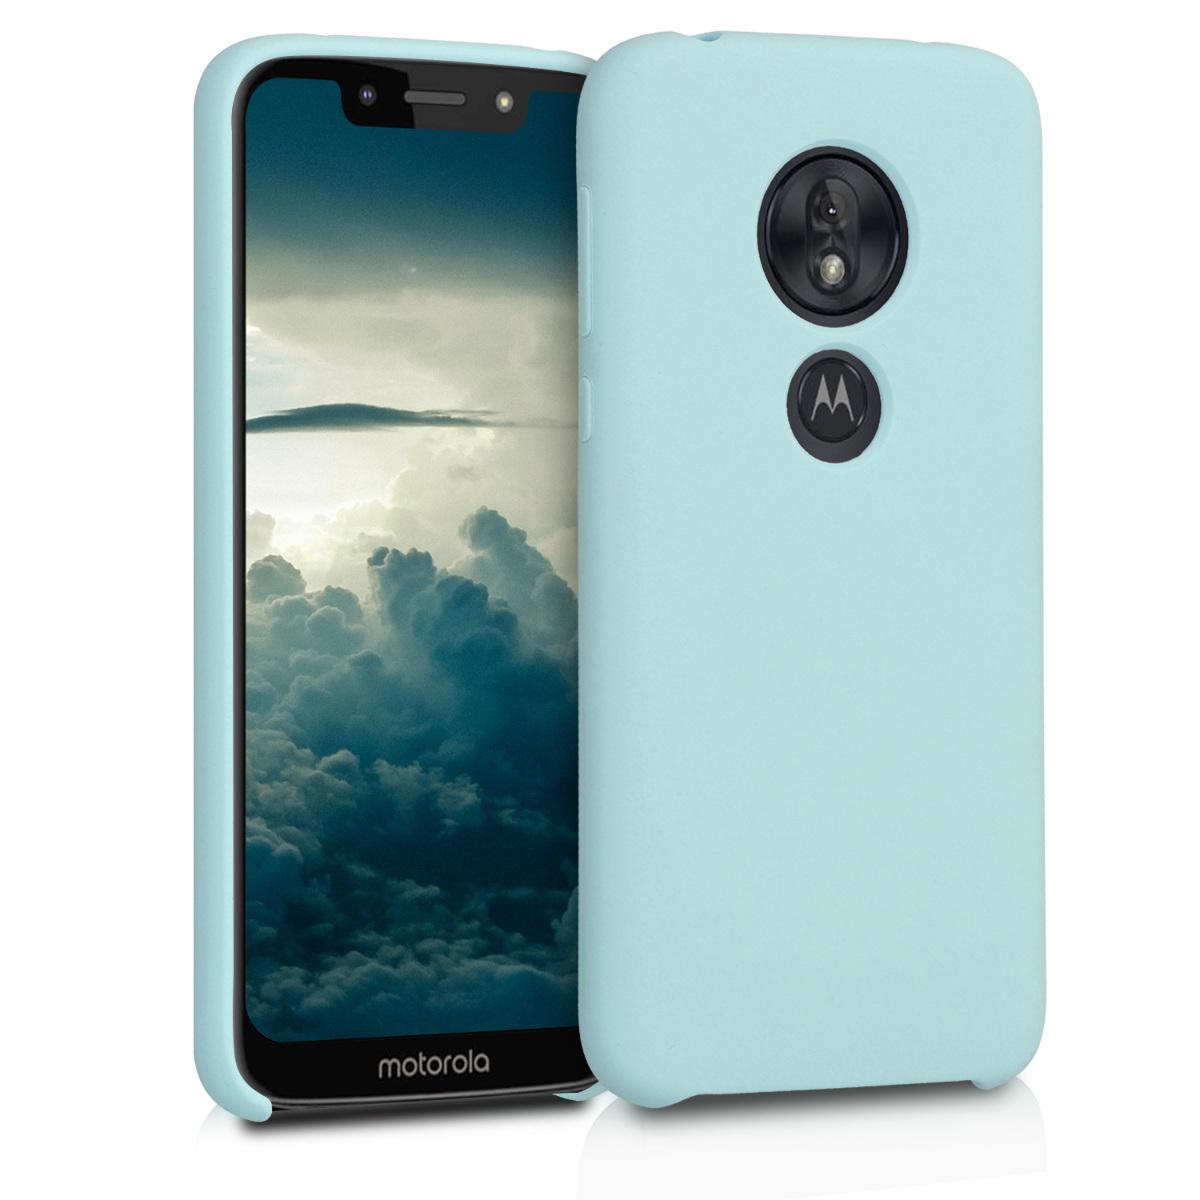 KW Θήκη Σιλικόνης Motorola Moto G7 Play - Soft Flexible Rubber - Mint (48631.71)